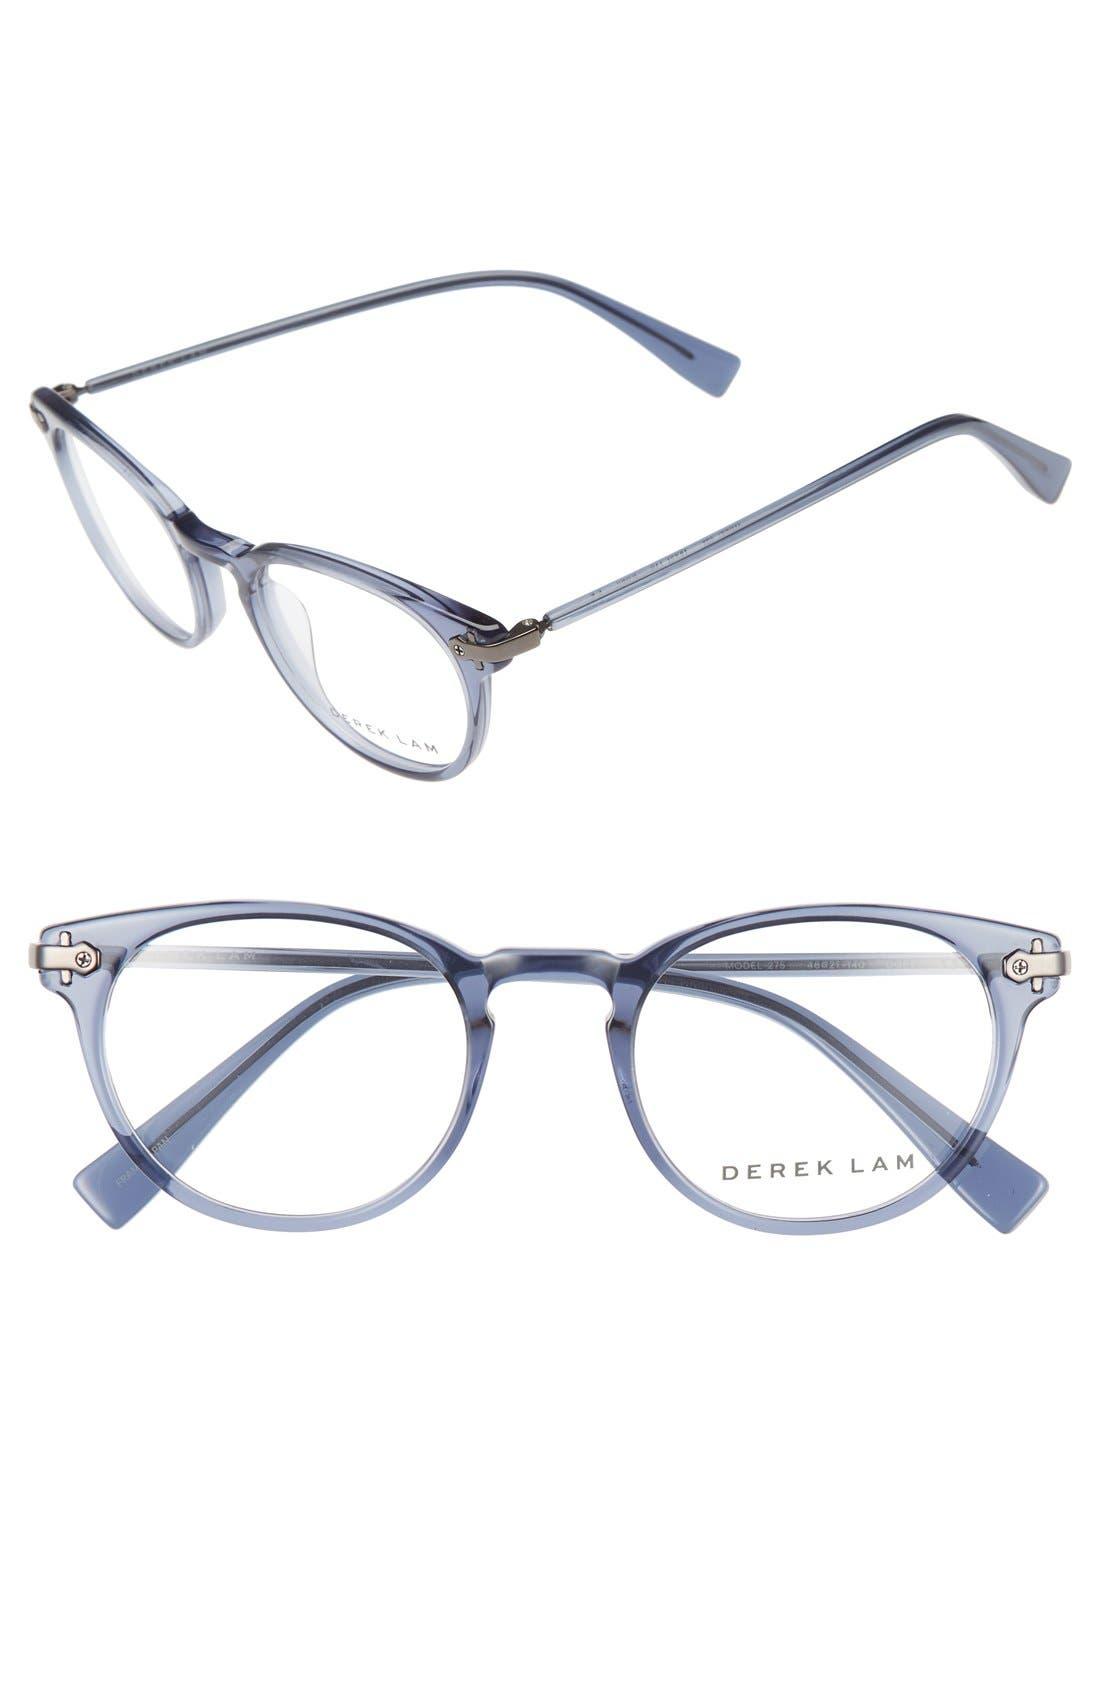 Derek Lam 48mm Optical Glasses